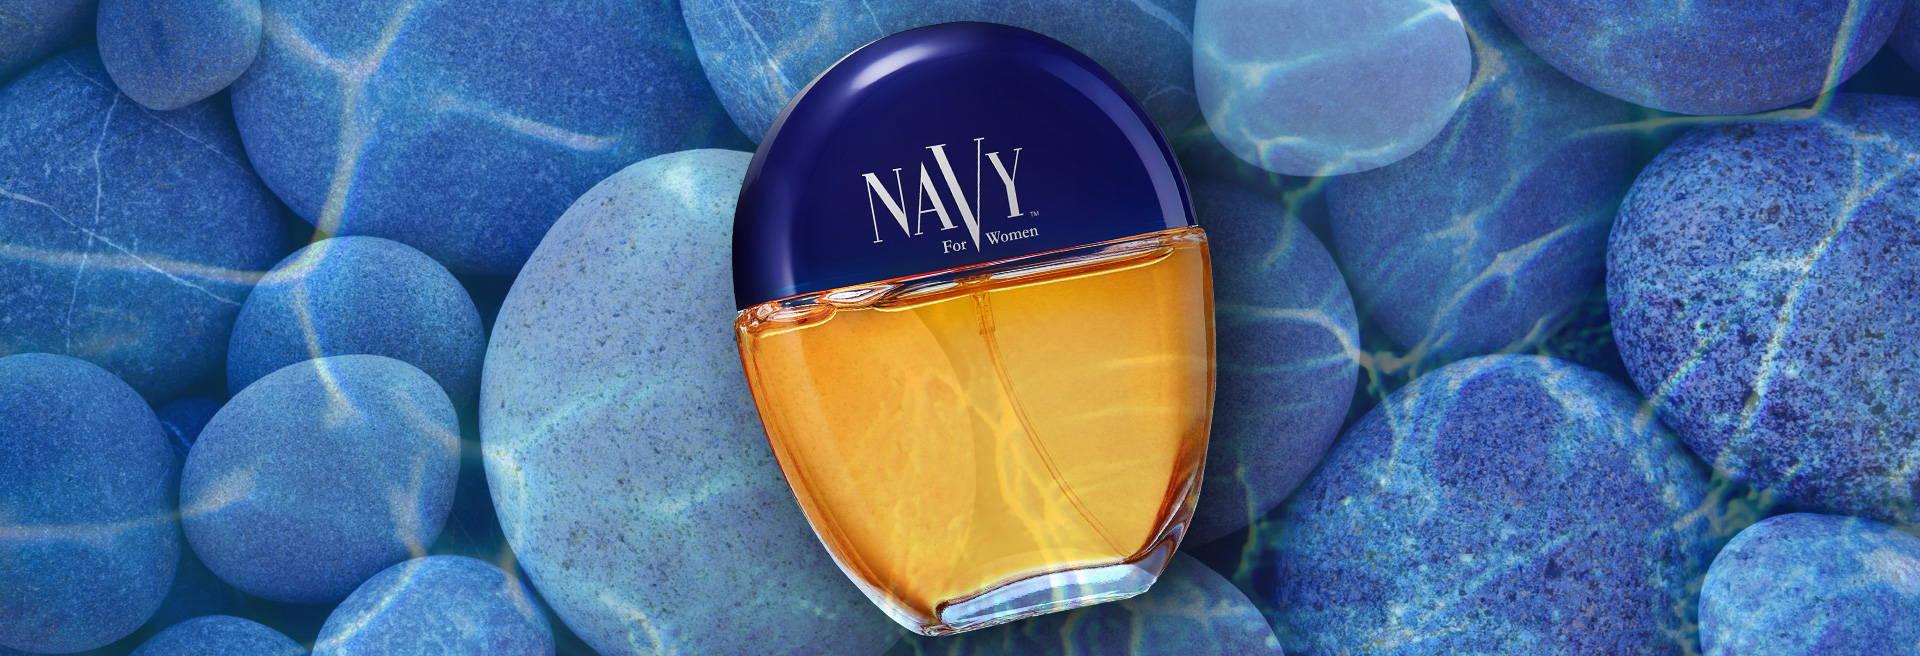 Bottle of Navy for Women cologne, pebbles under water, ocean